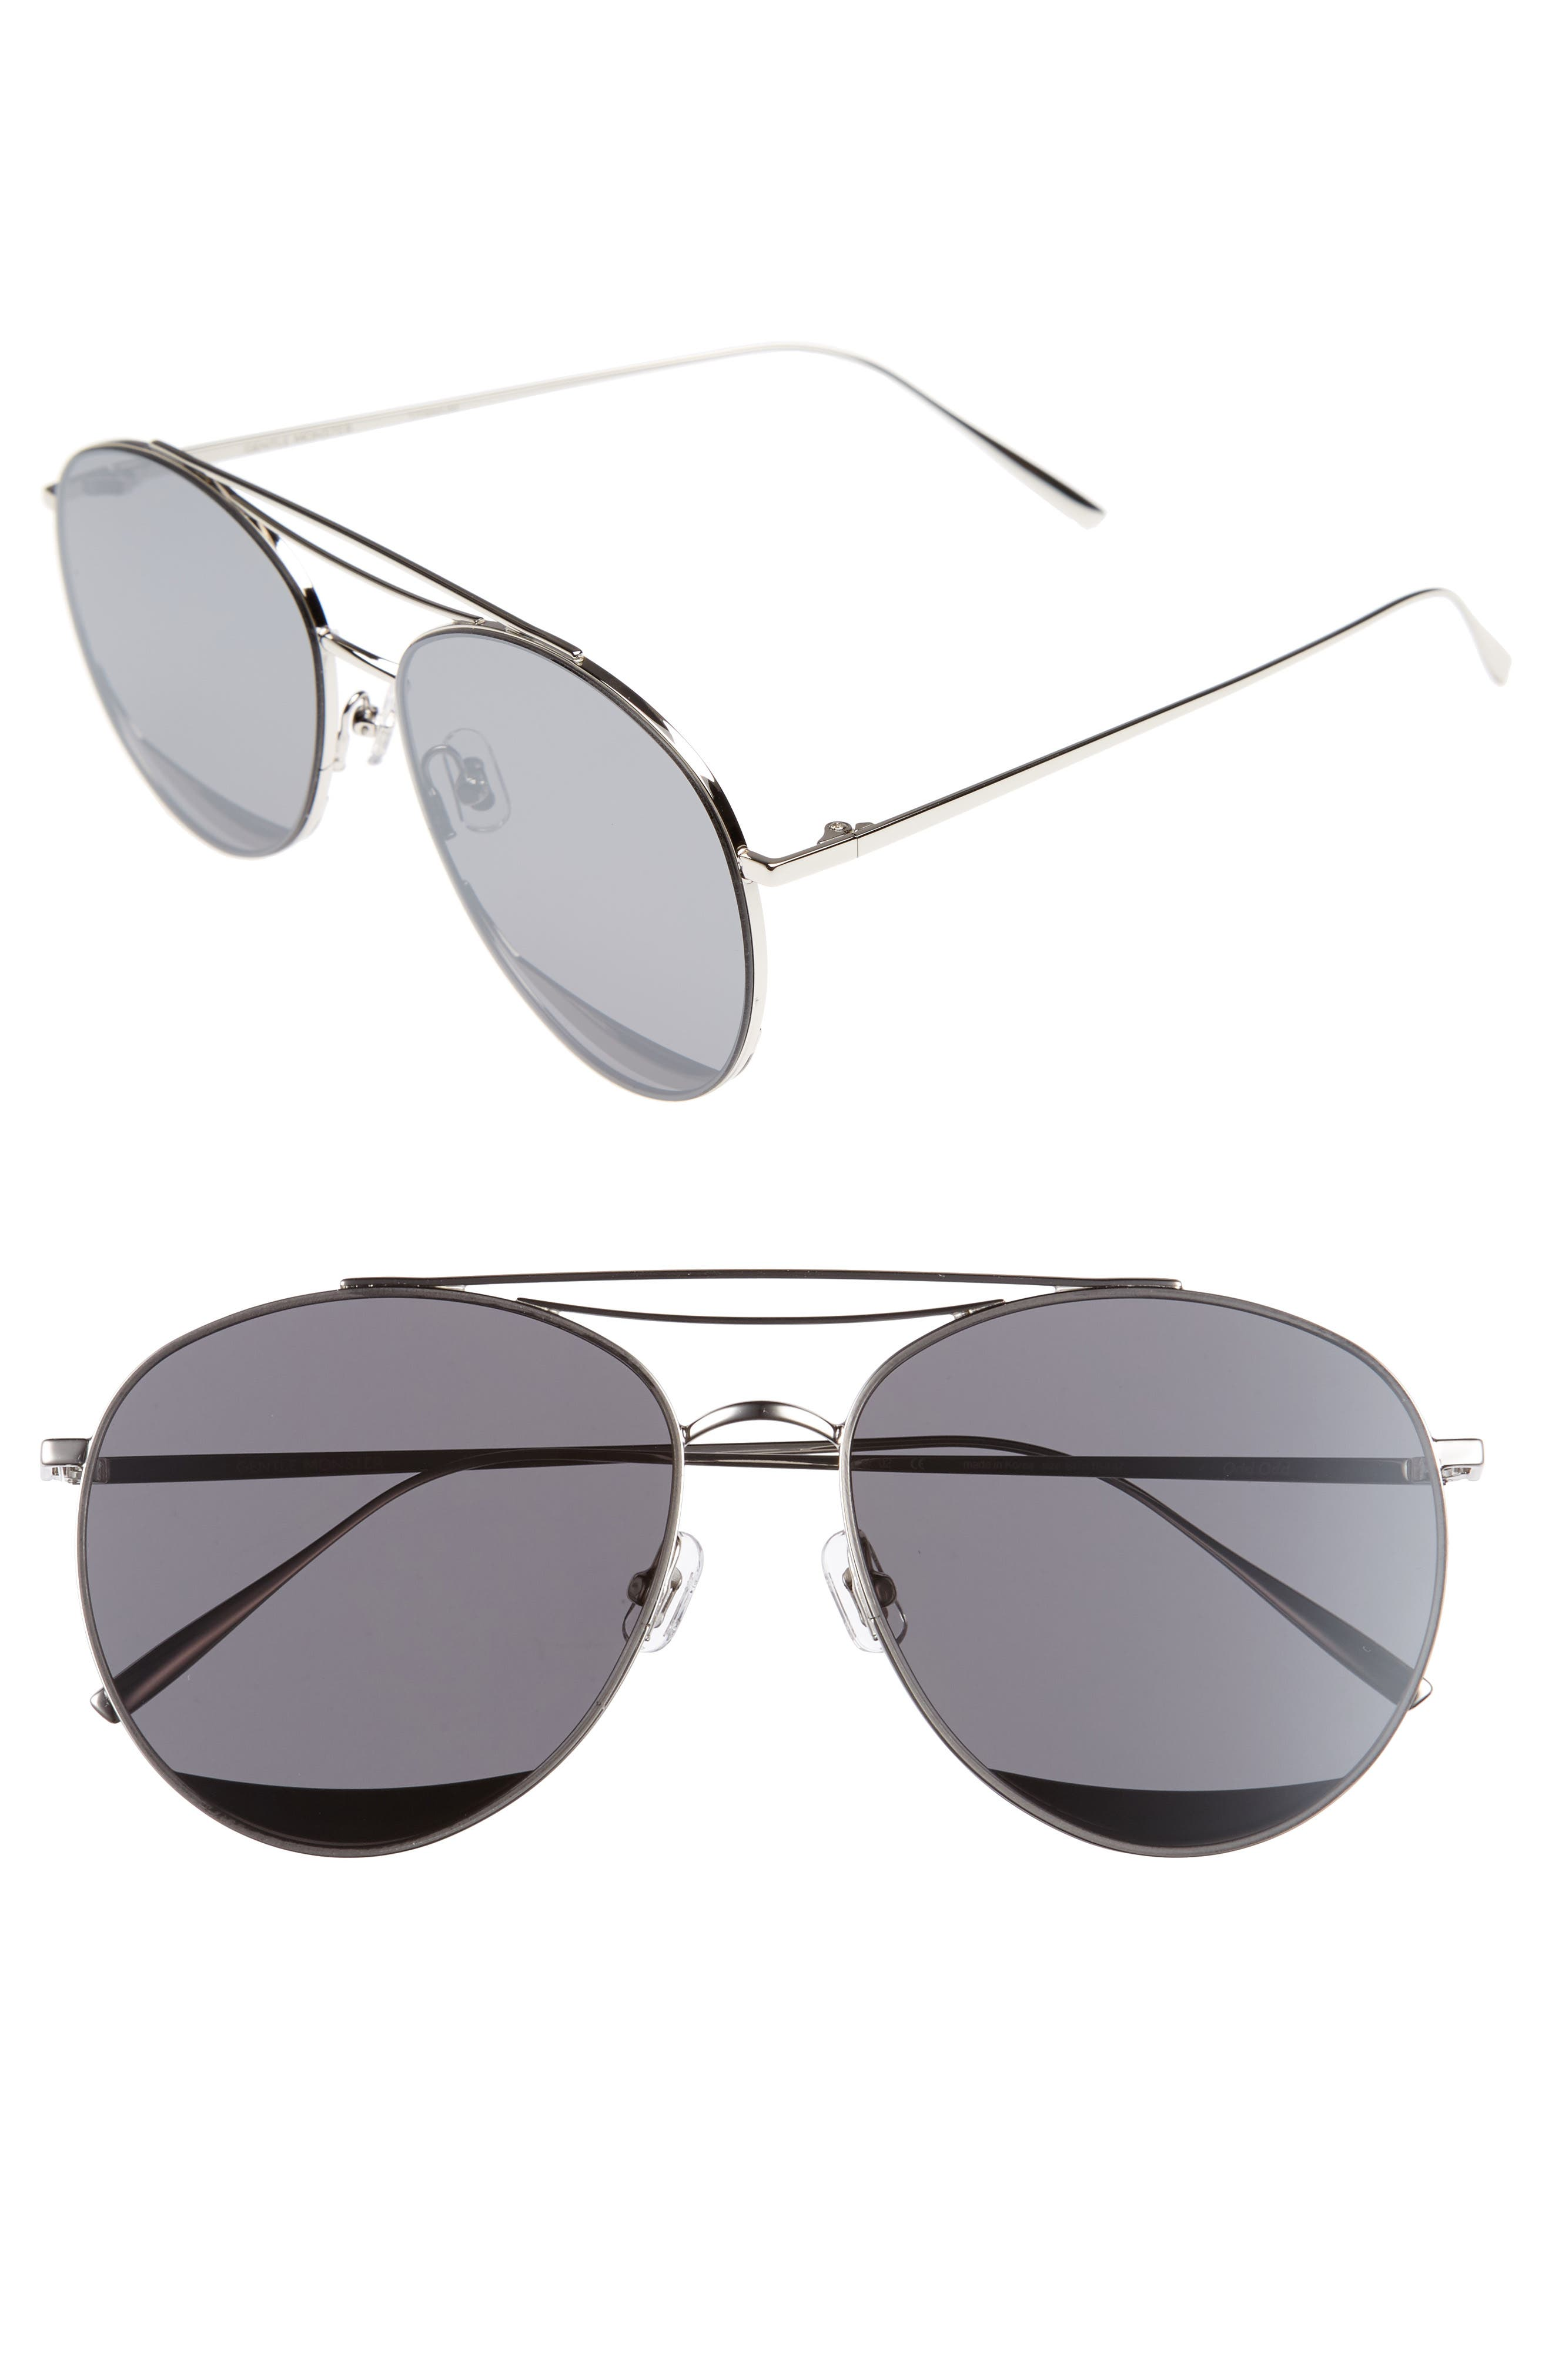 Main Image - Gentle Monster Odd Odd 61mm Aviator Sunglasses